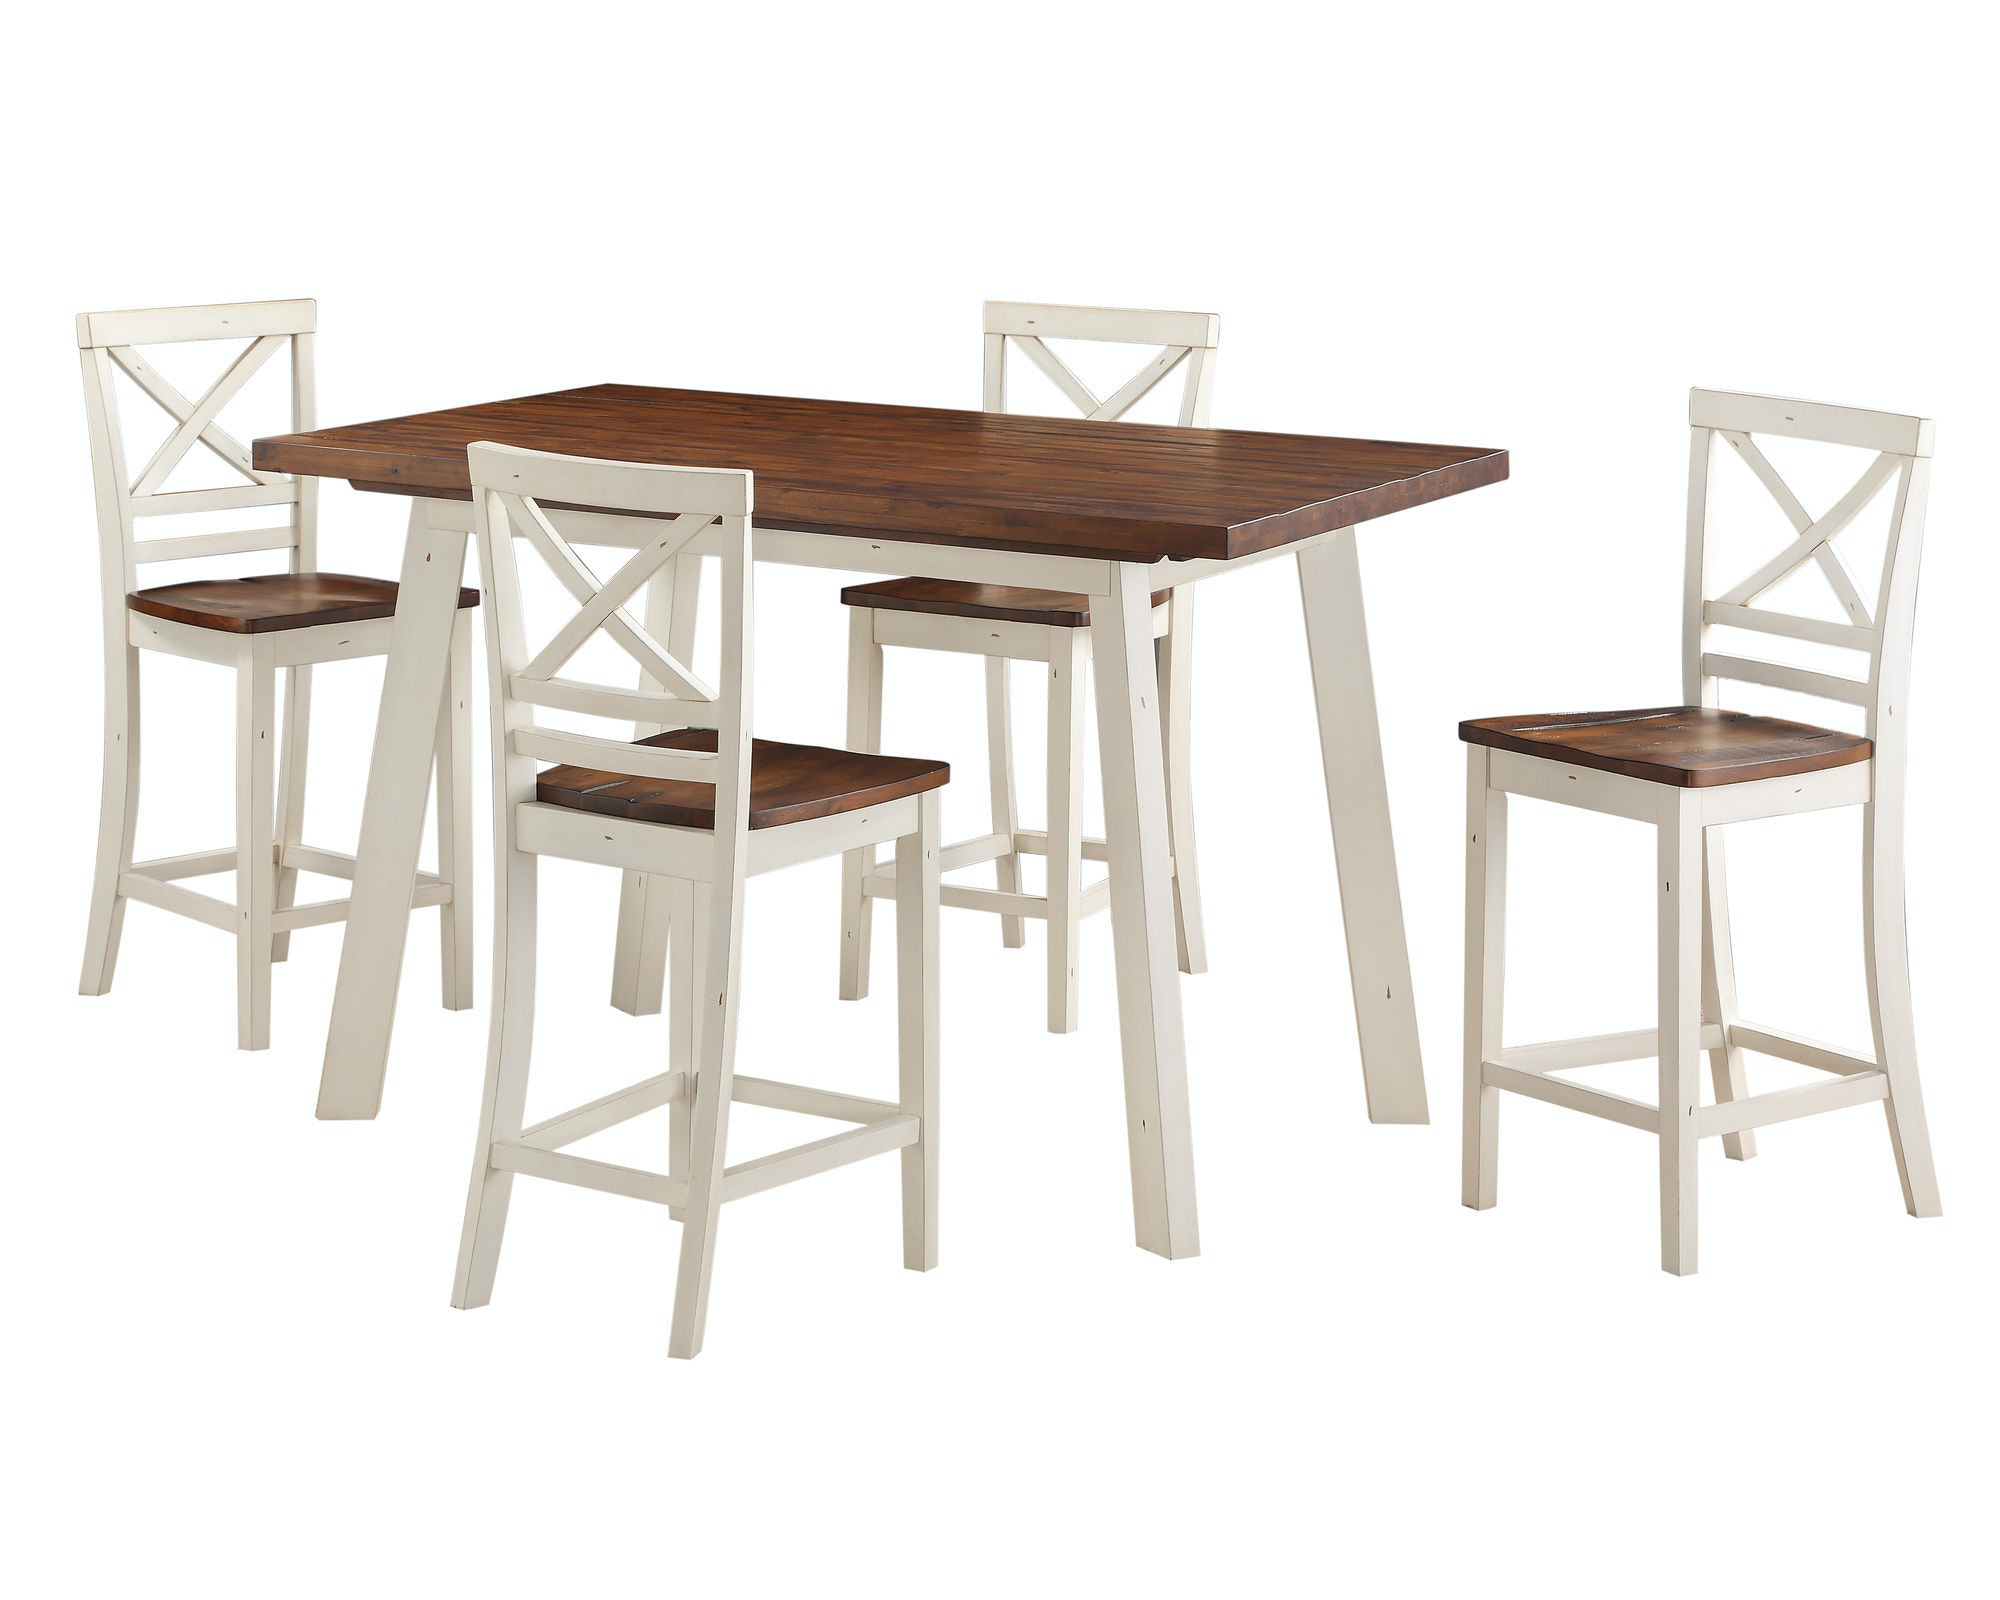 Tate Furniture